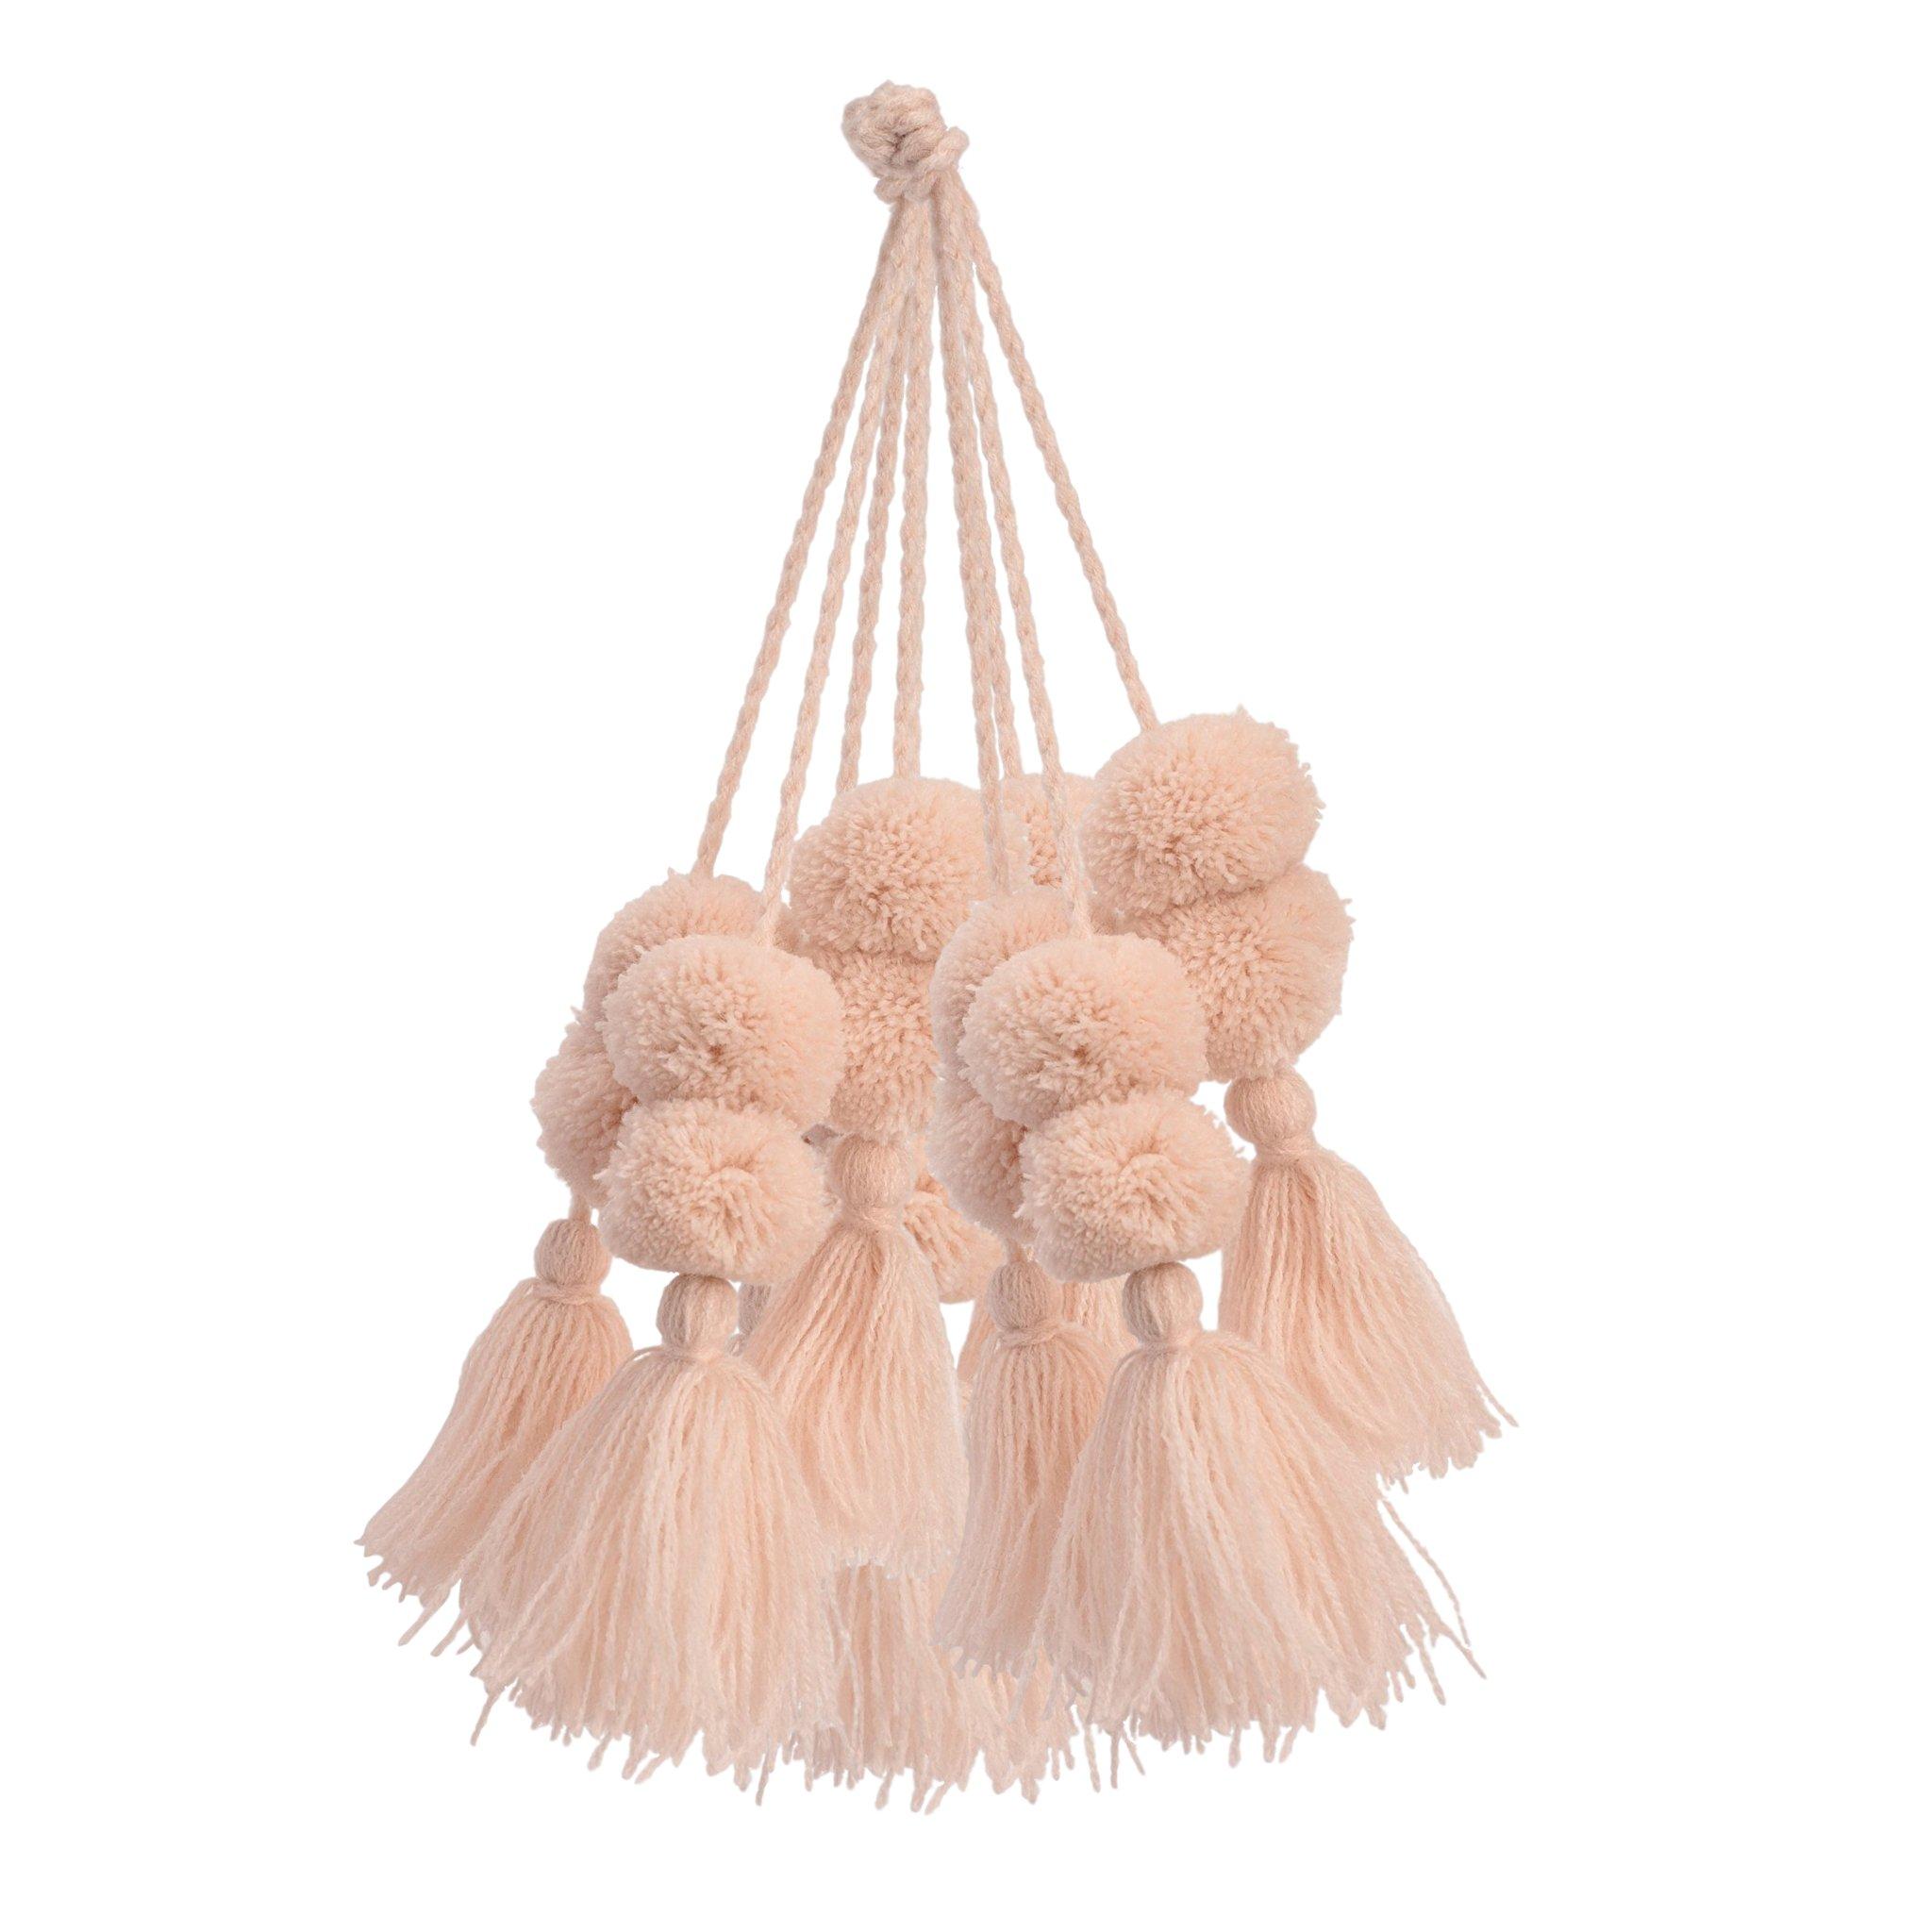 Blush Coral Pom Pom Bag Charm Set